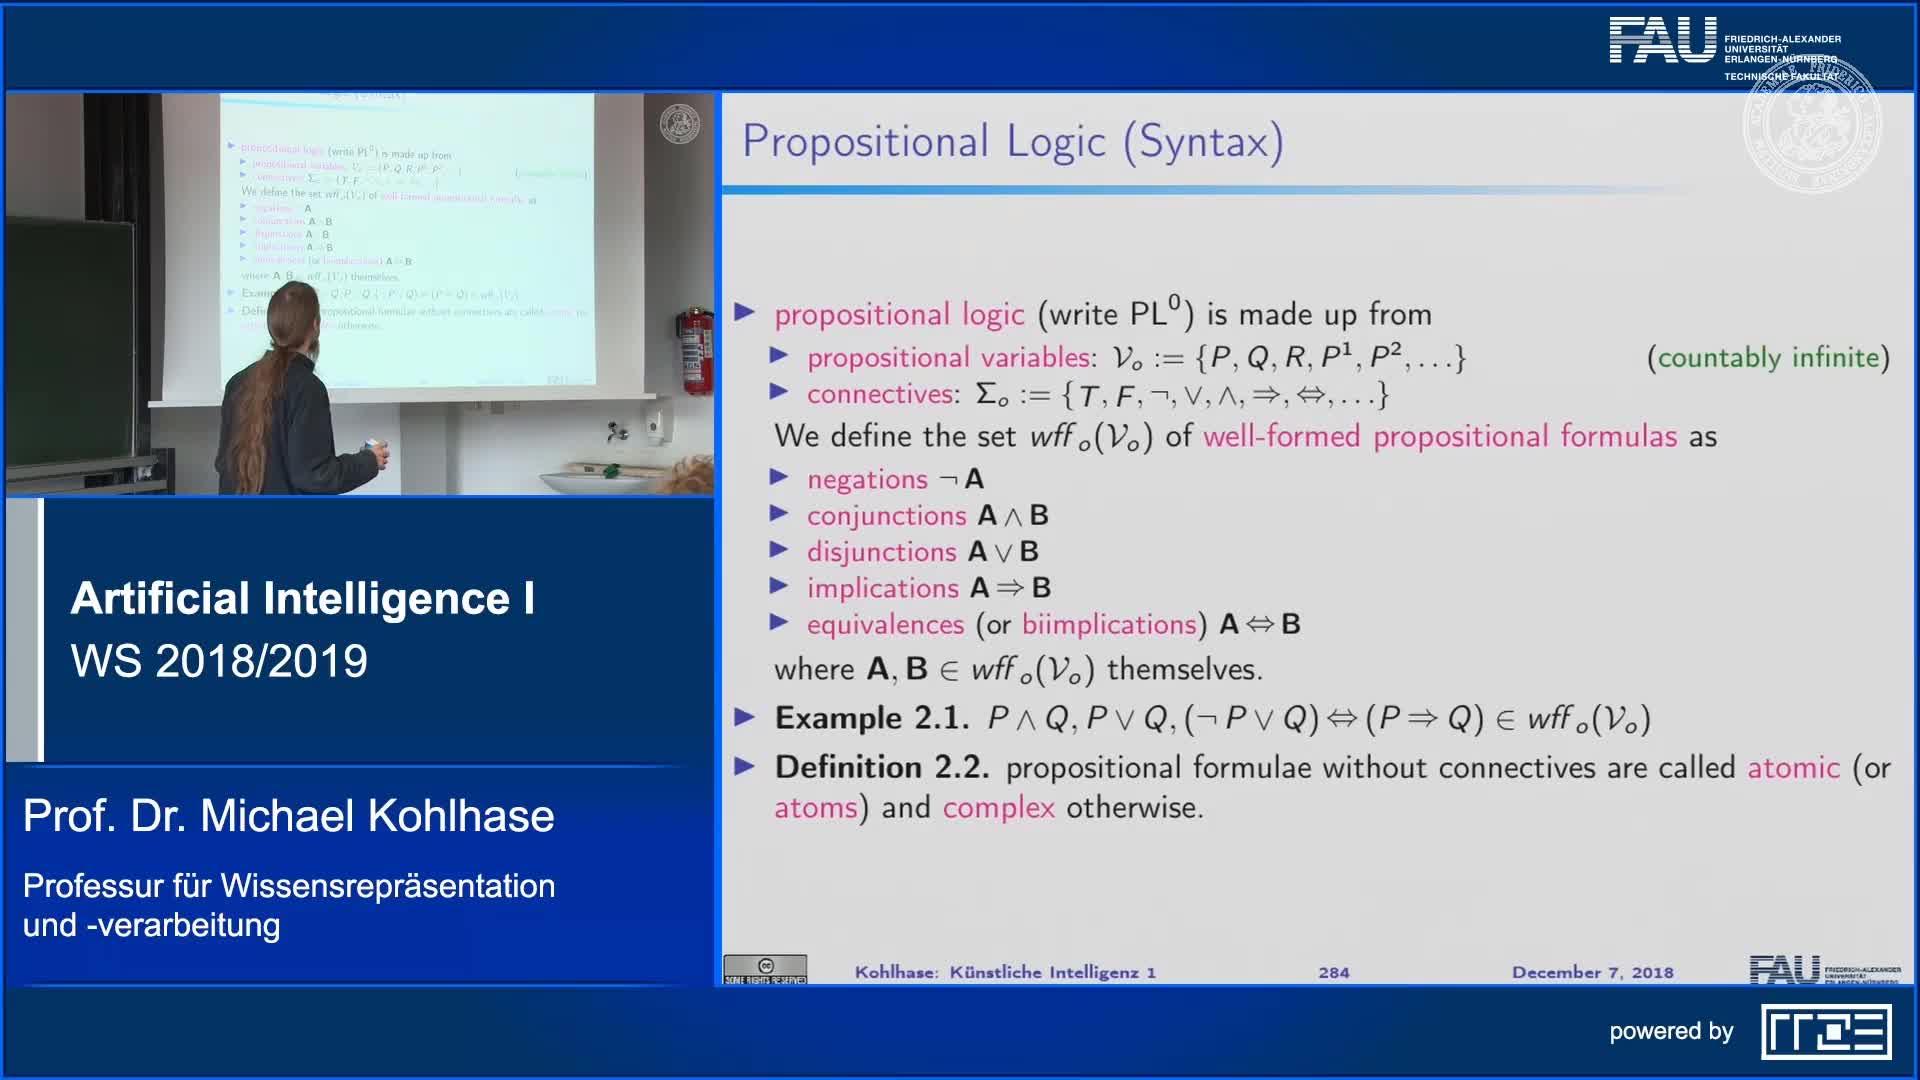 Propositional Logic (Syntax, Semantics) (Part 1) preview image